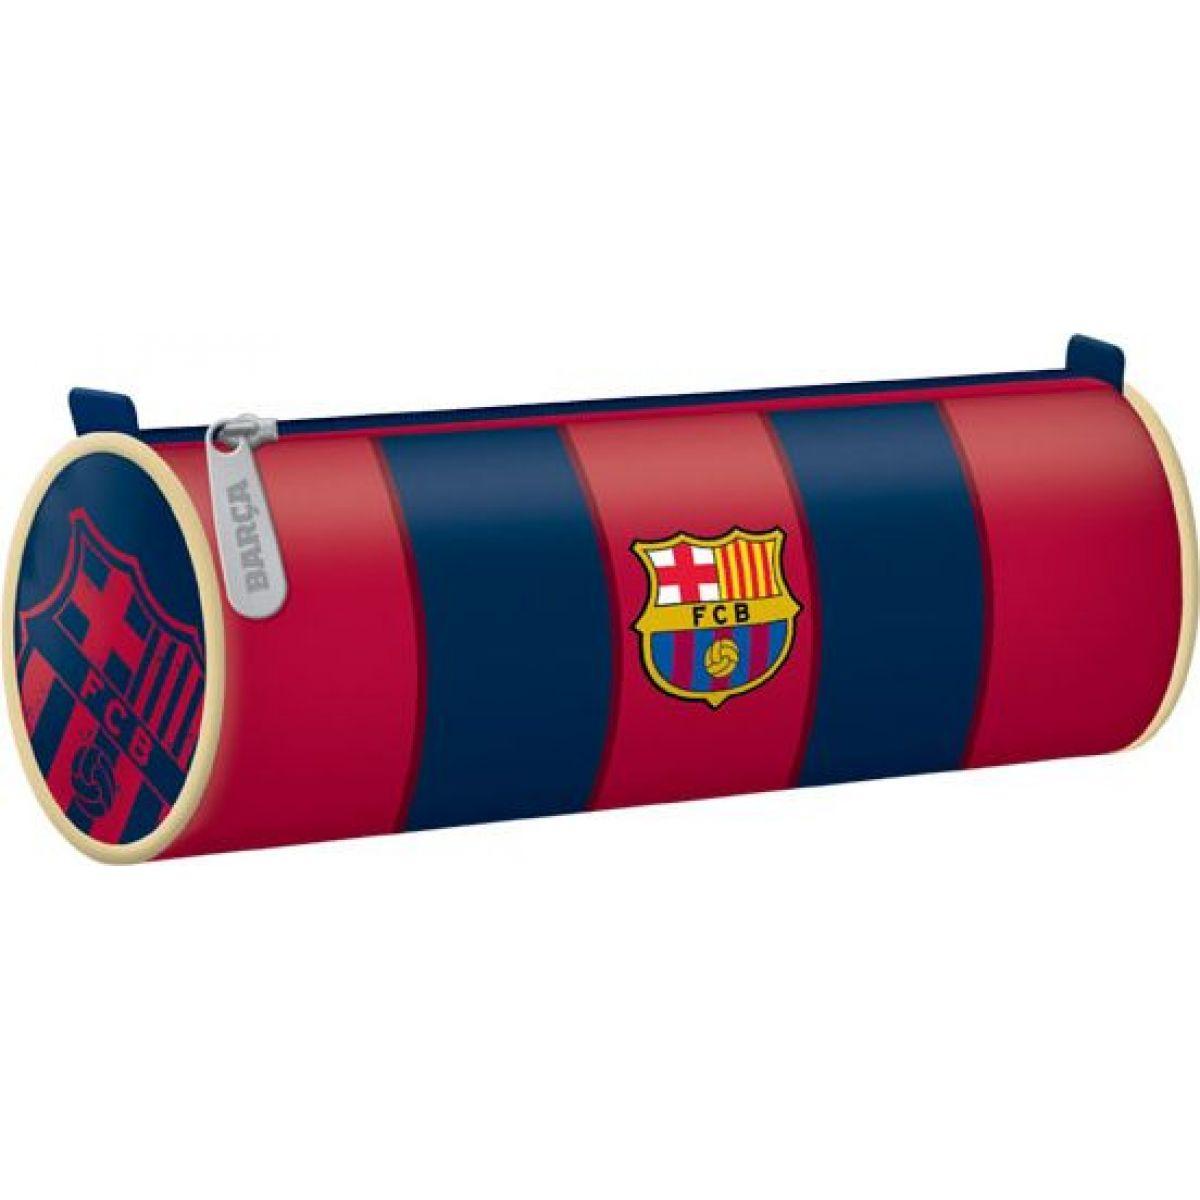 Ars Una Peračník FC Barcelona Stripe kulatý